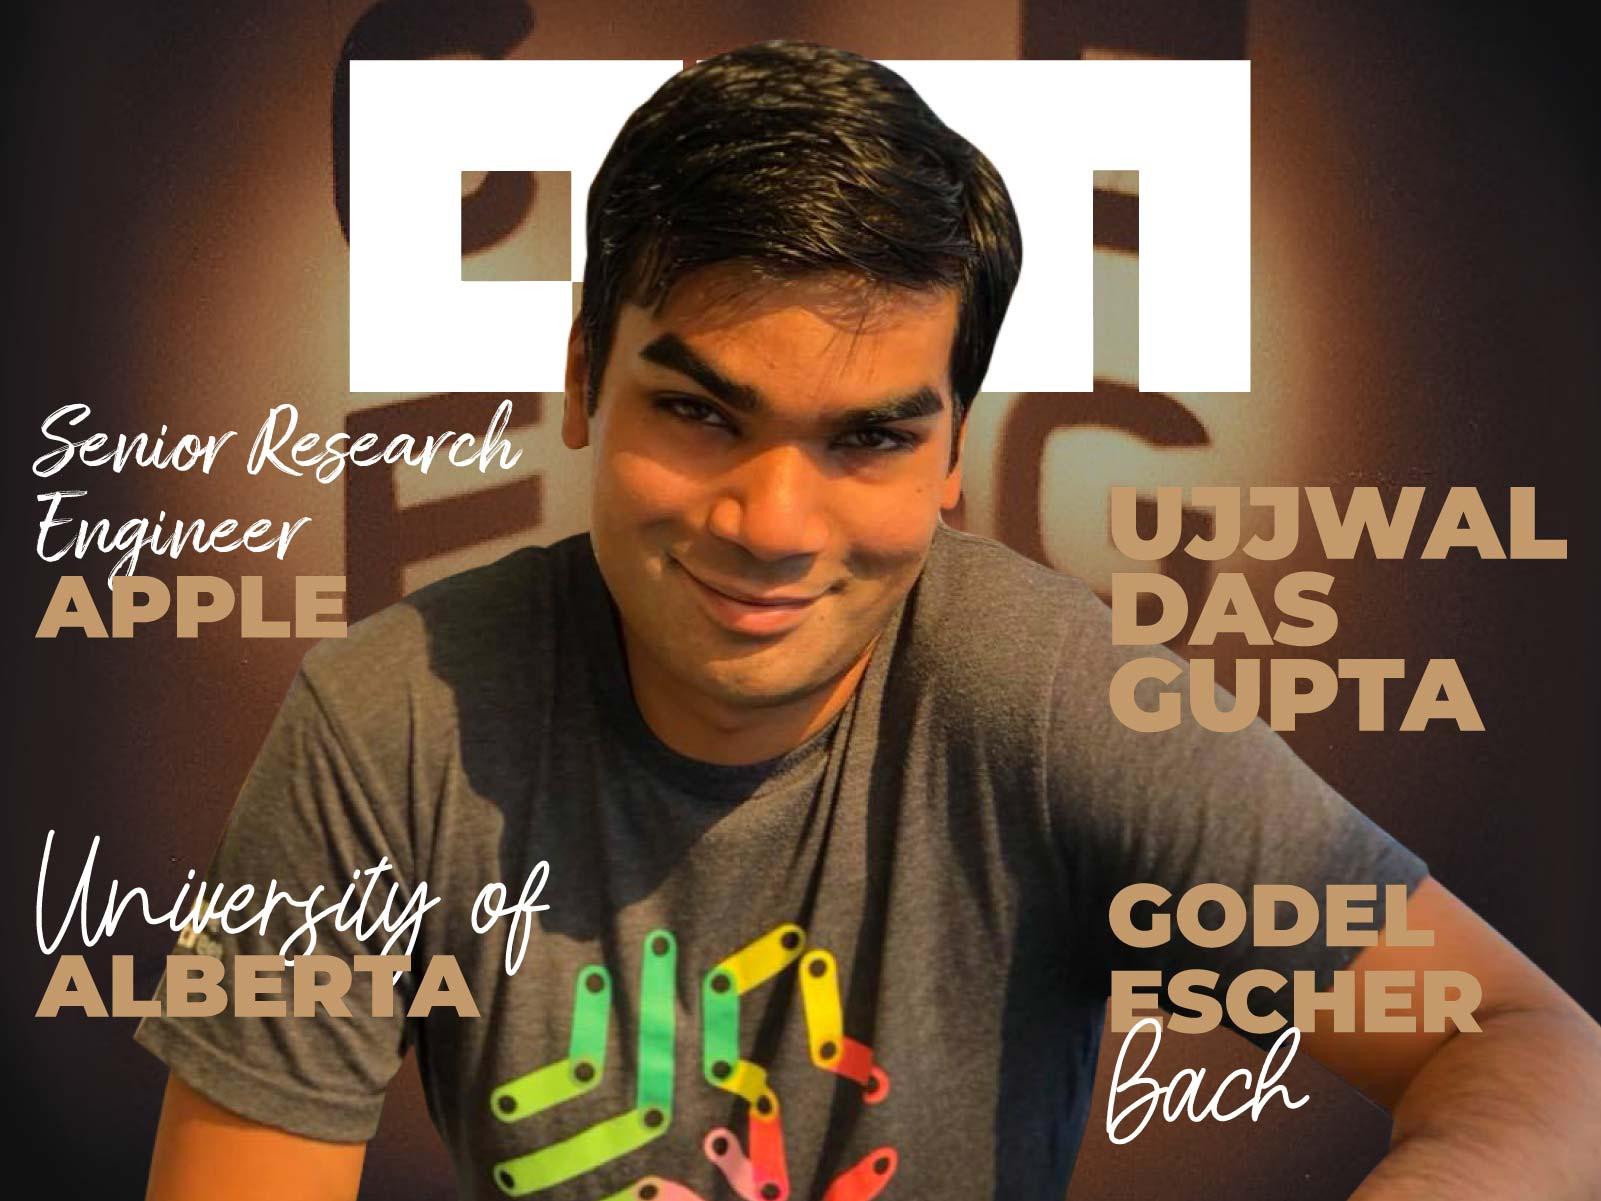 Interview With Ujjwal Das Gupta, Senior Research Engineer, Apple